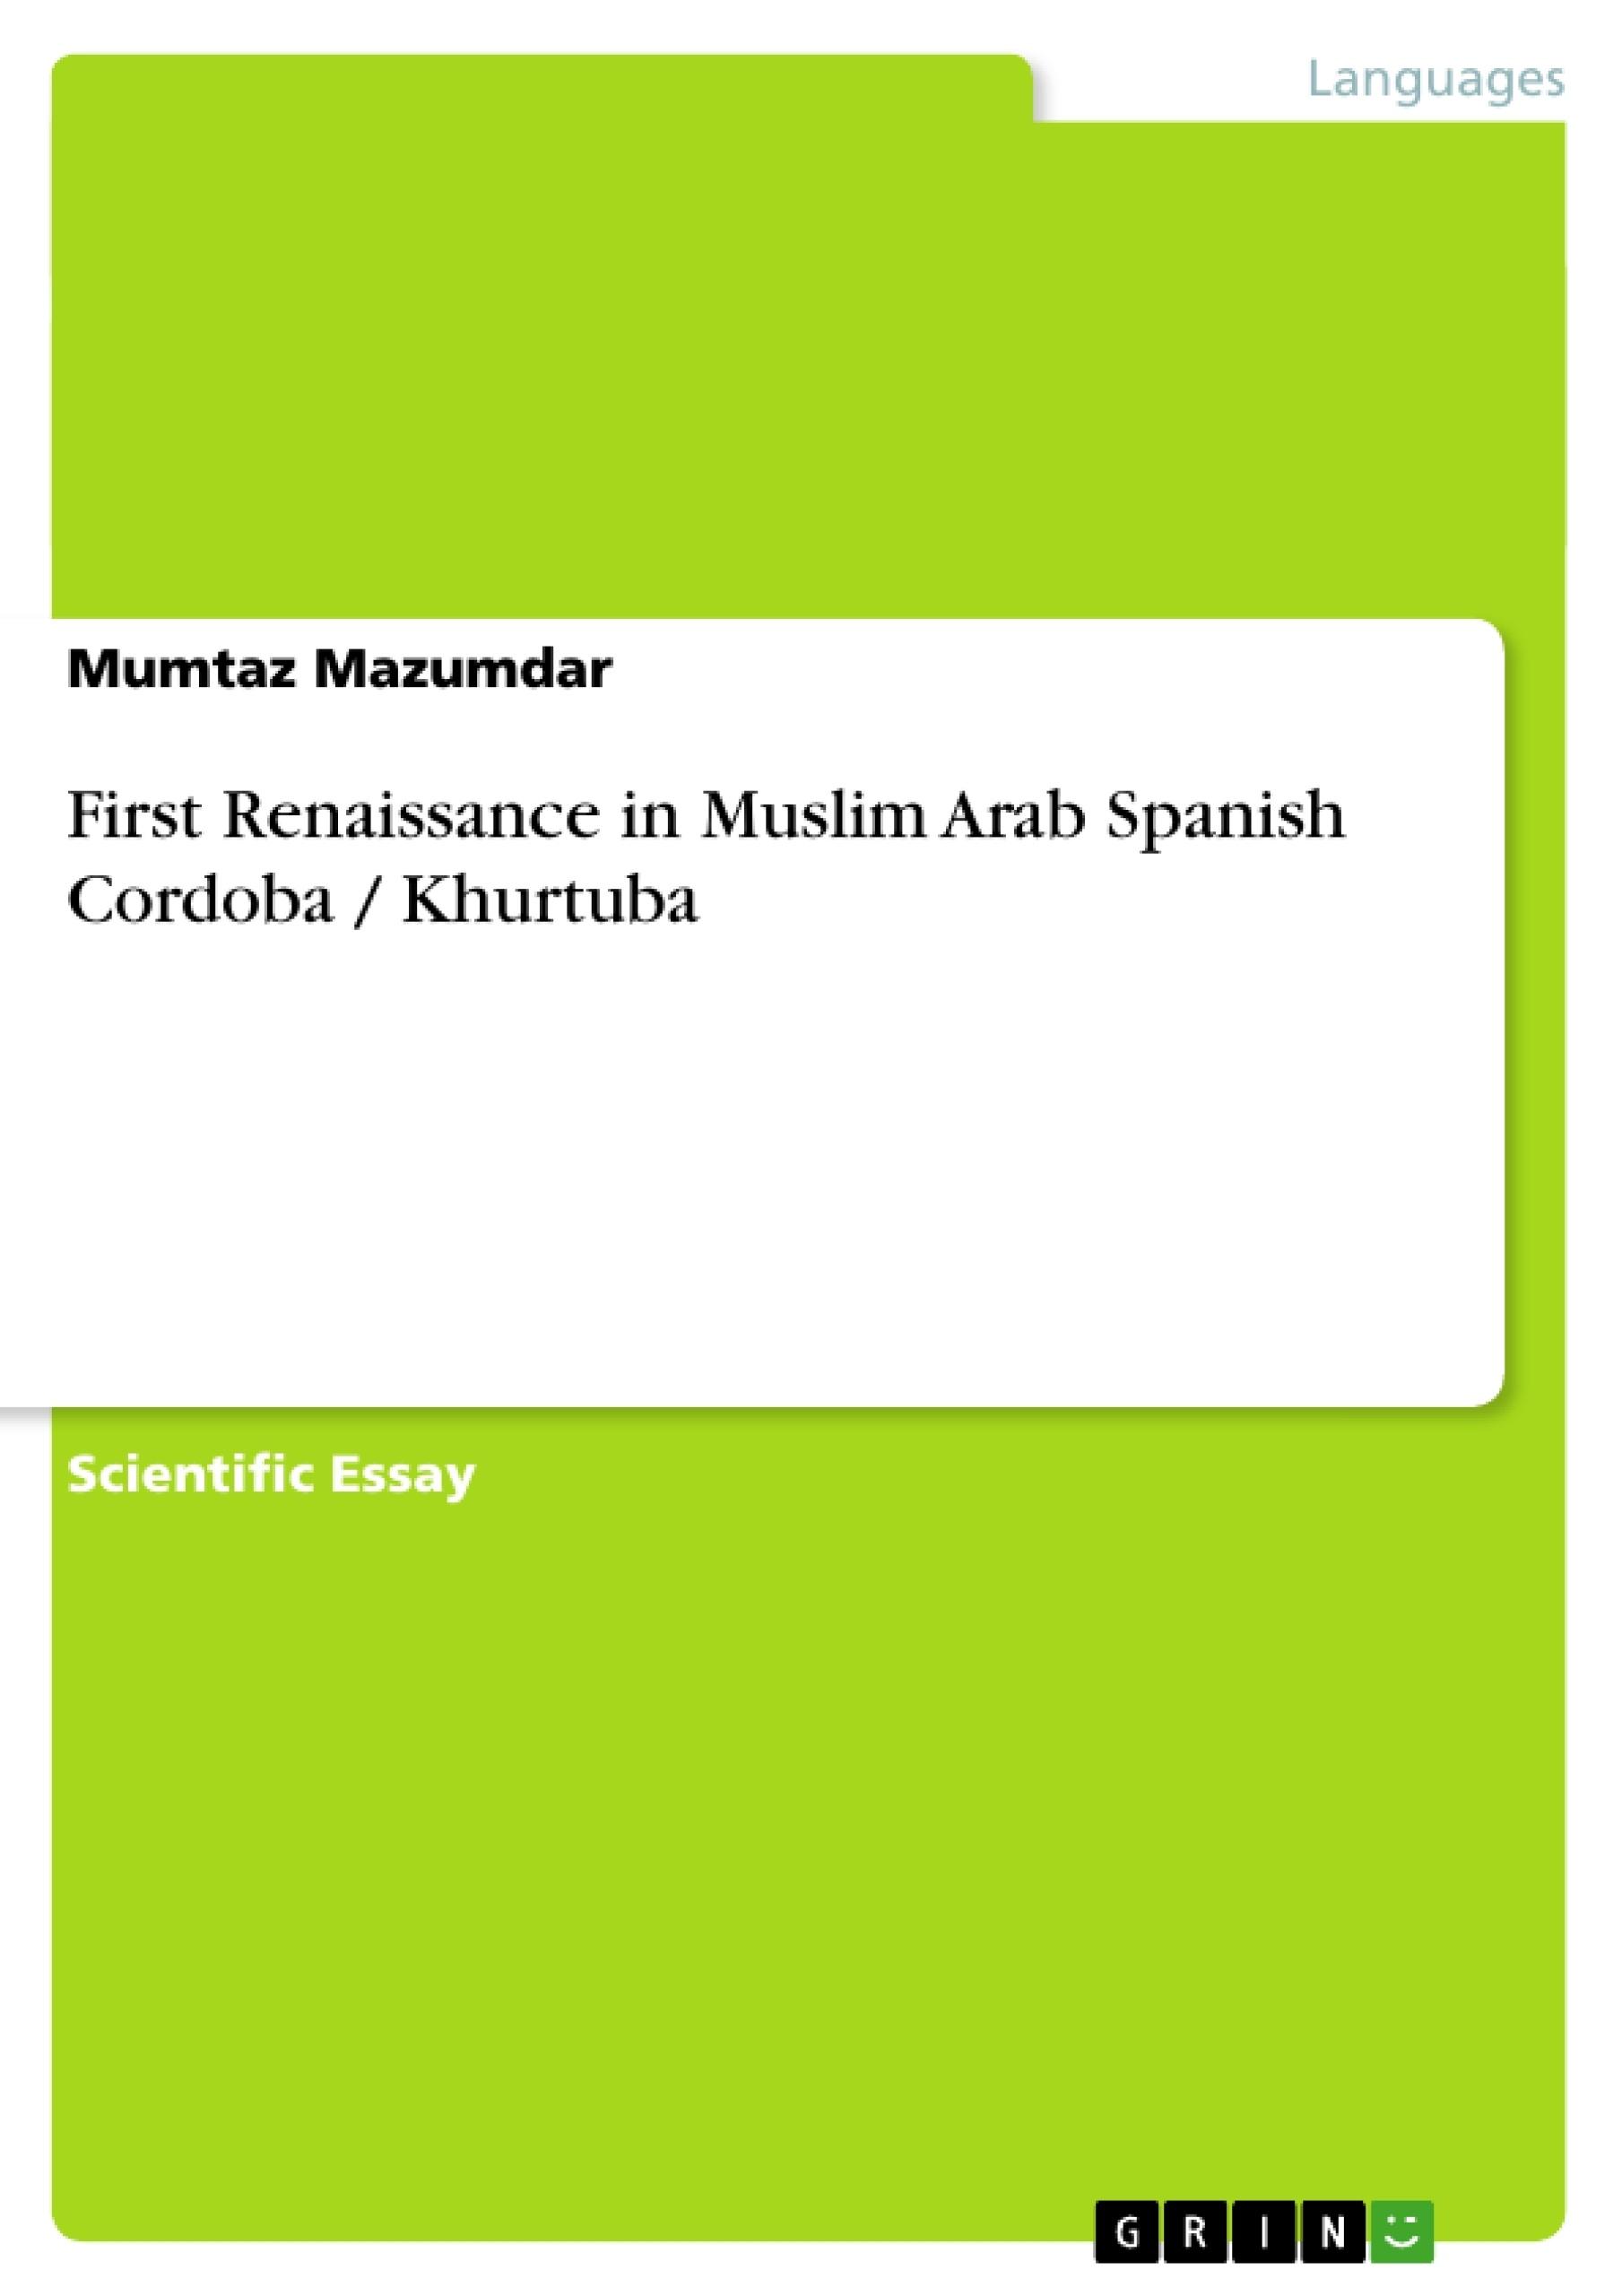 Title: First Renaissance in Muslim Arab Spanish Cordoba / Khurtuba